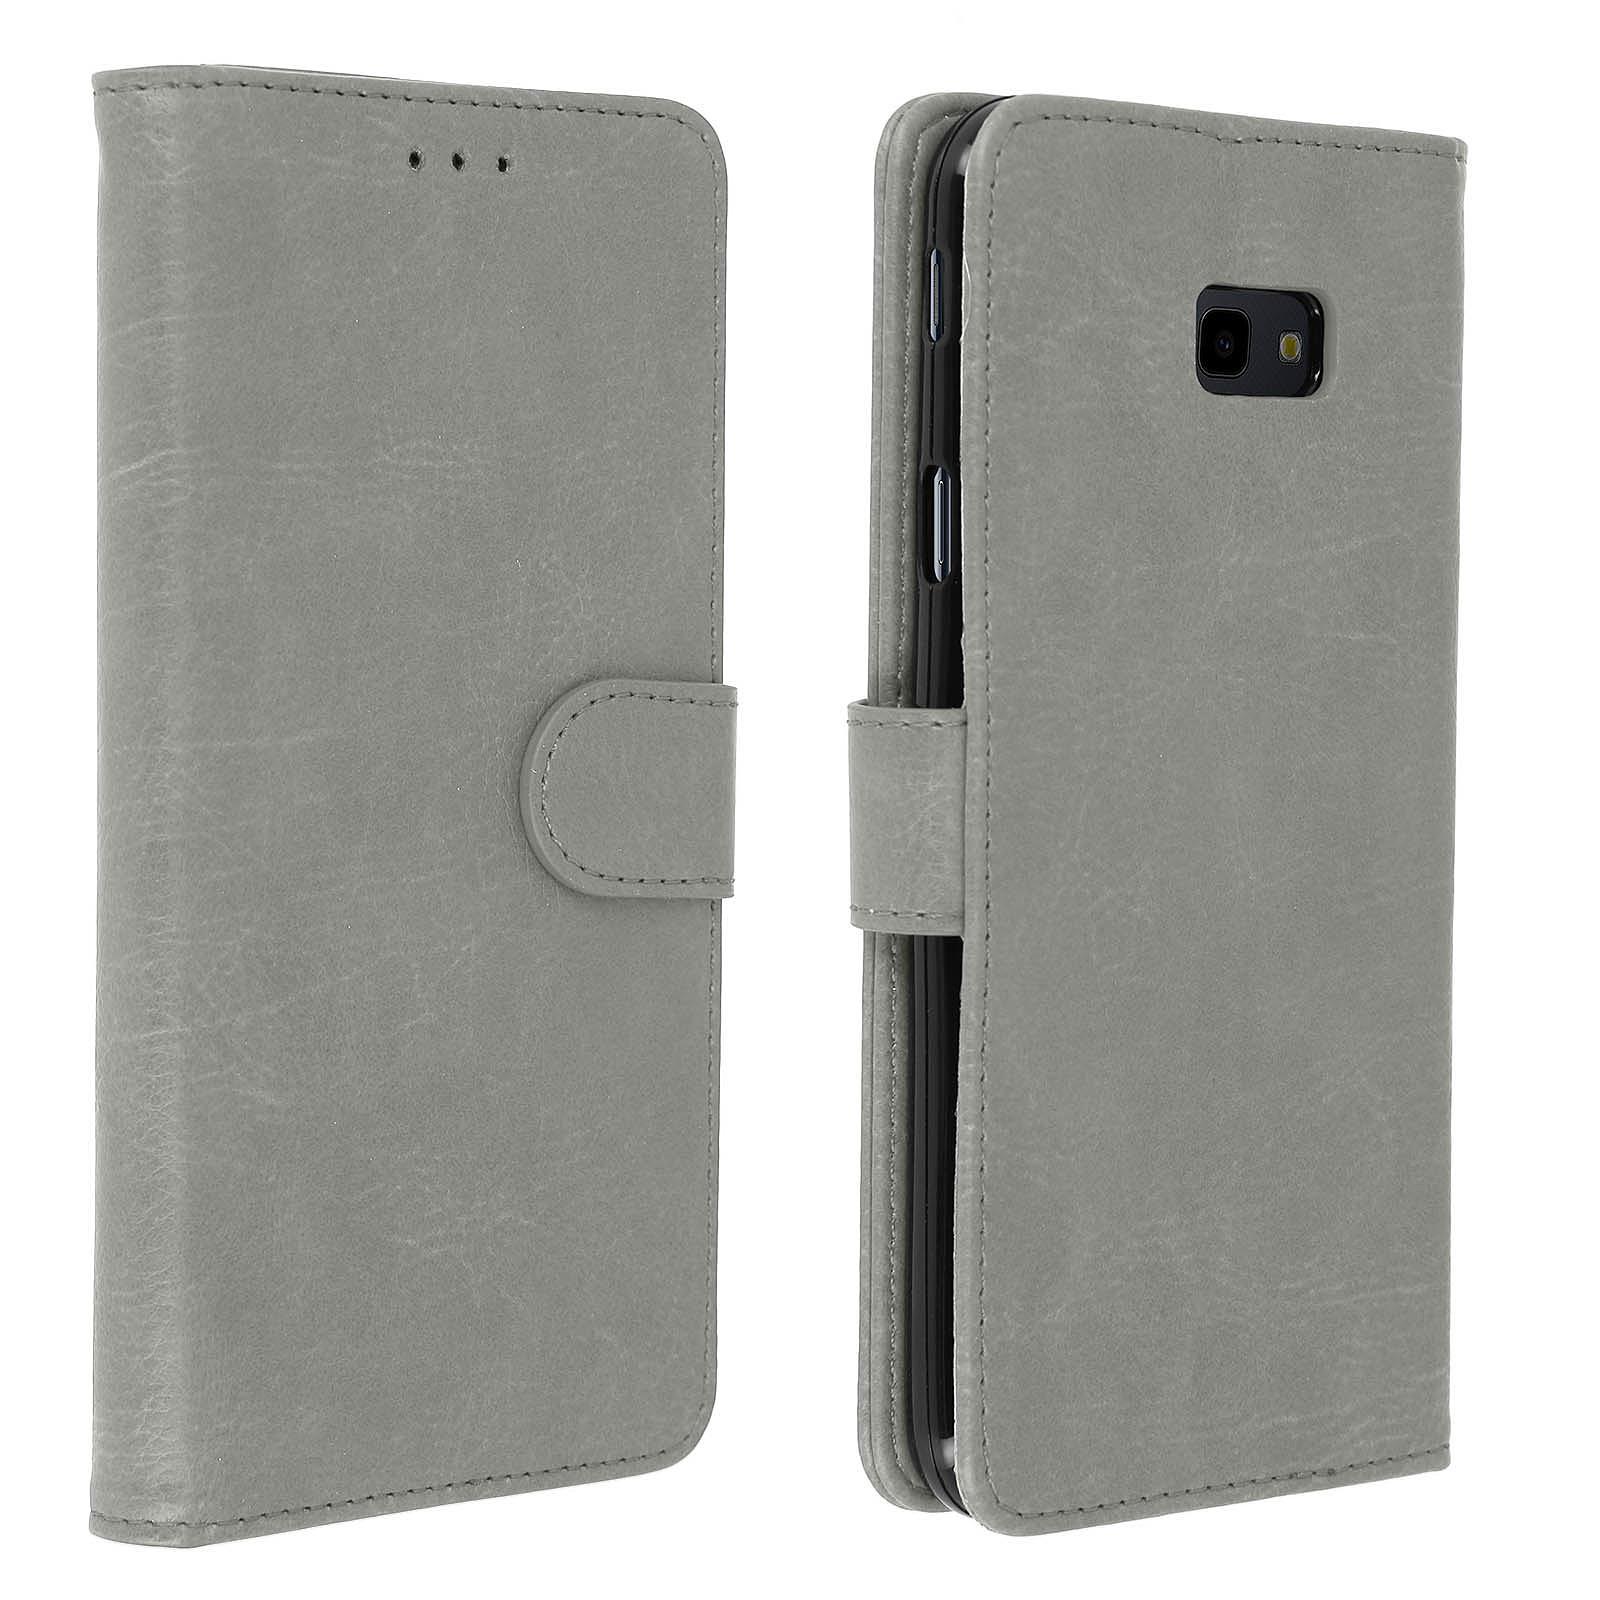 Avizar Etui folio Gris pour Samsung Galaxy J4 Plus